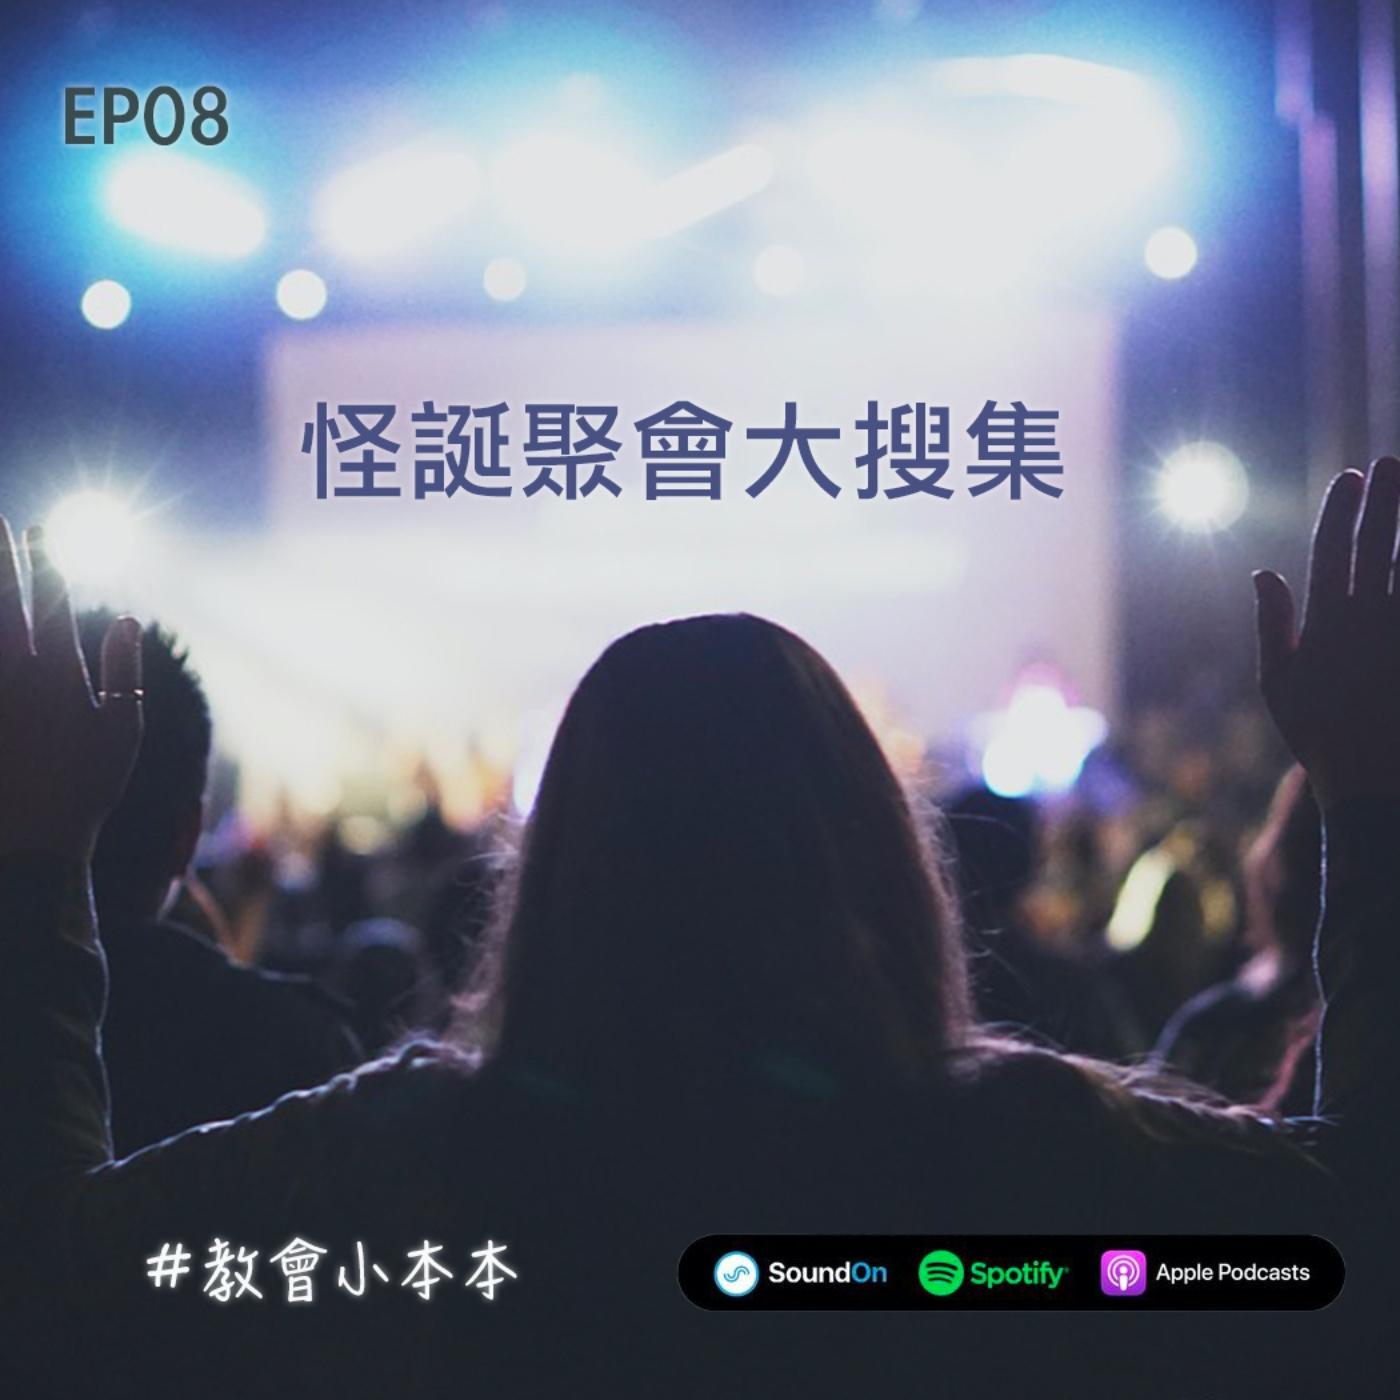 EP08怪誕聚會大搜集